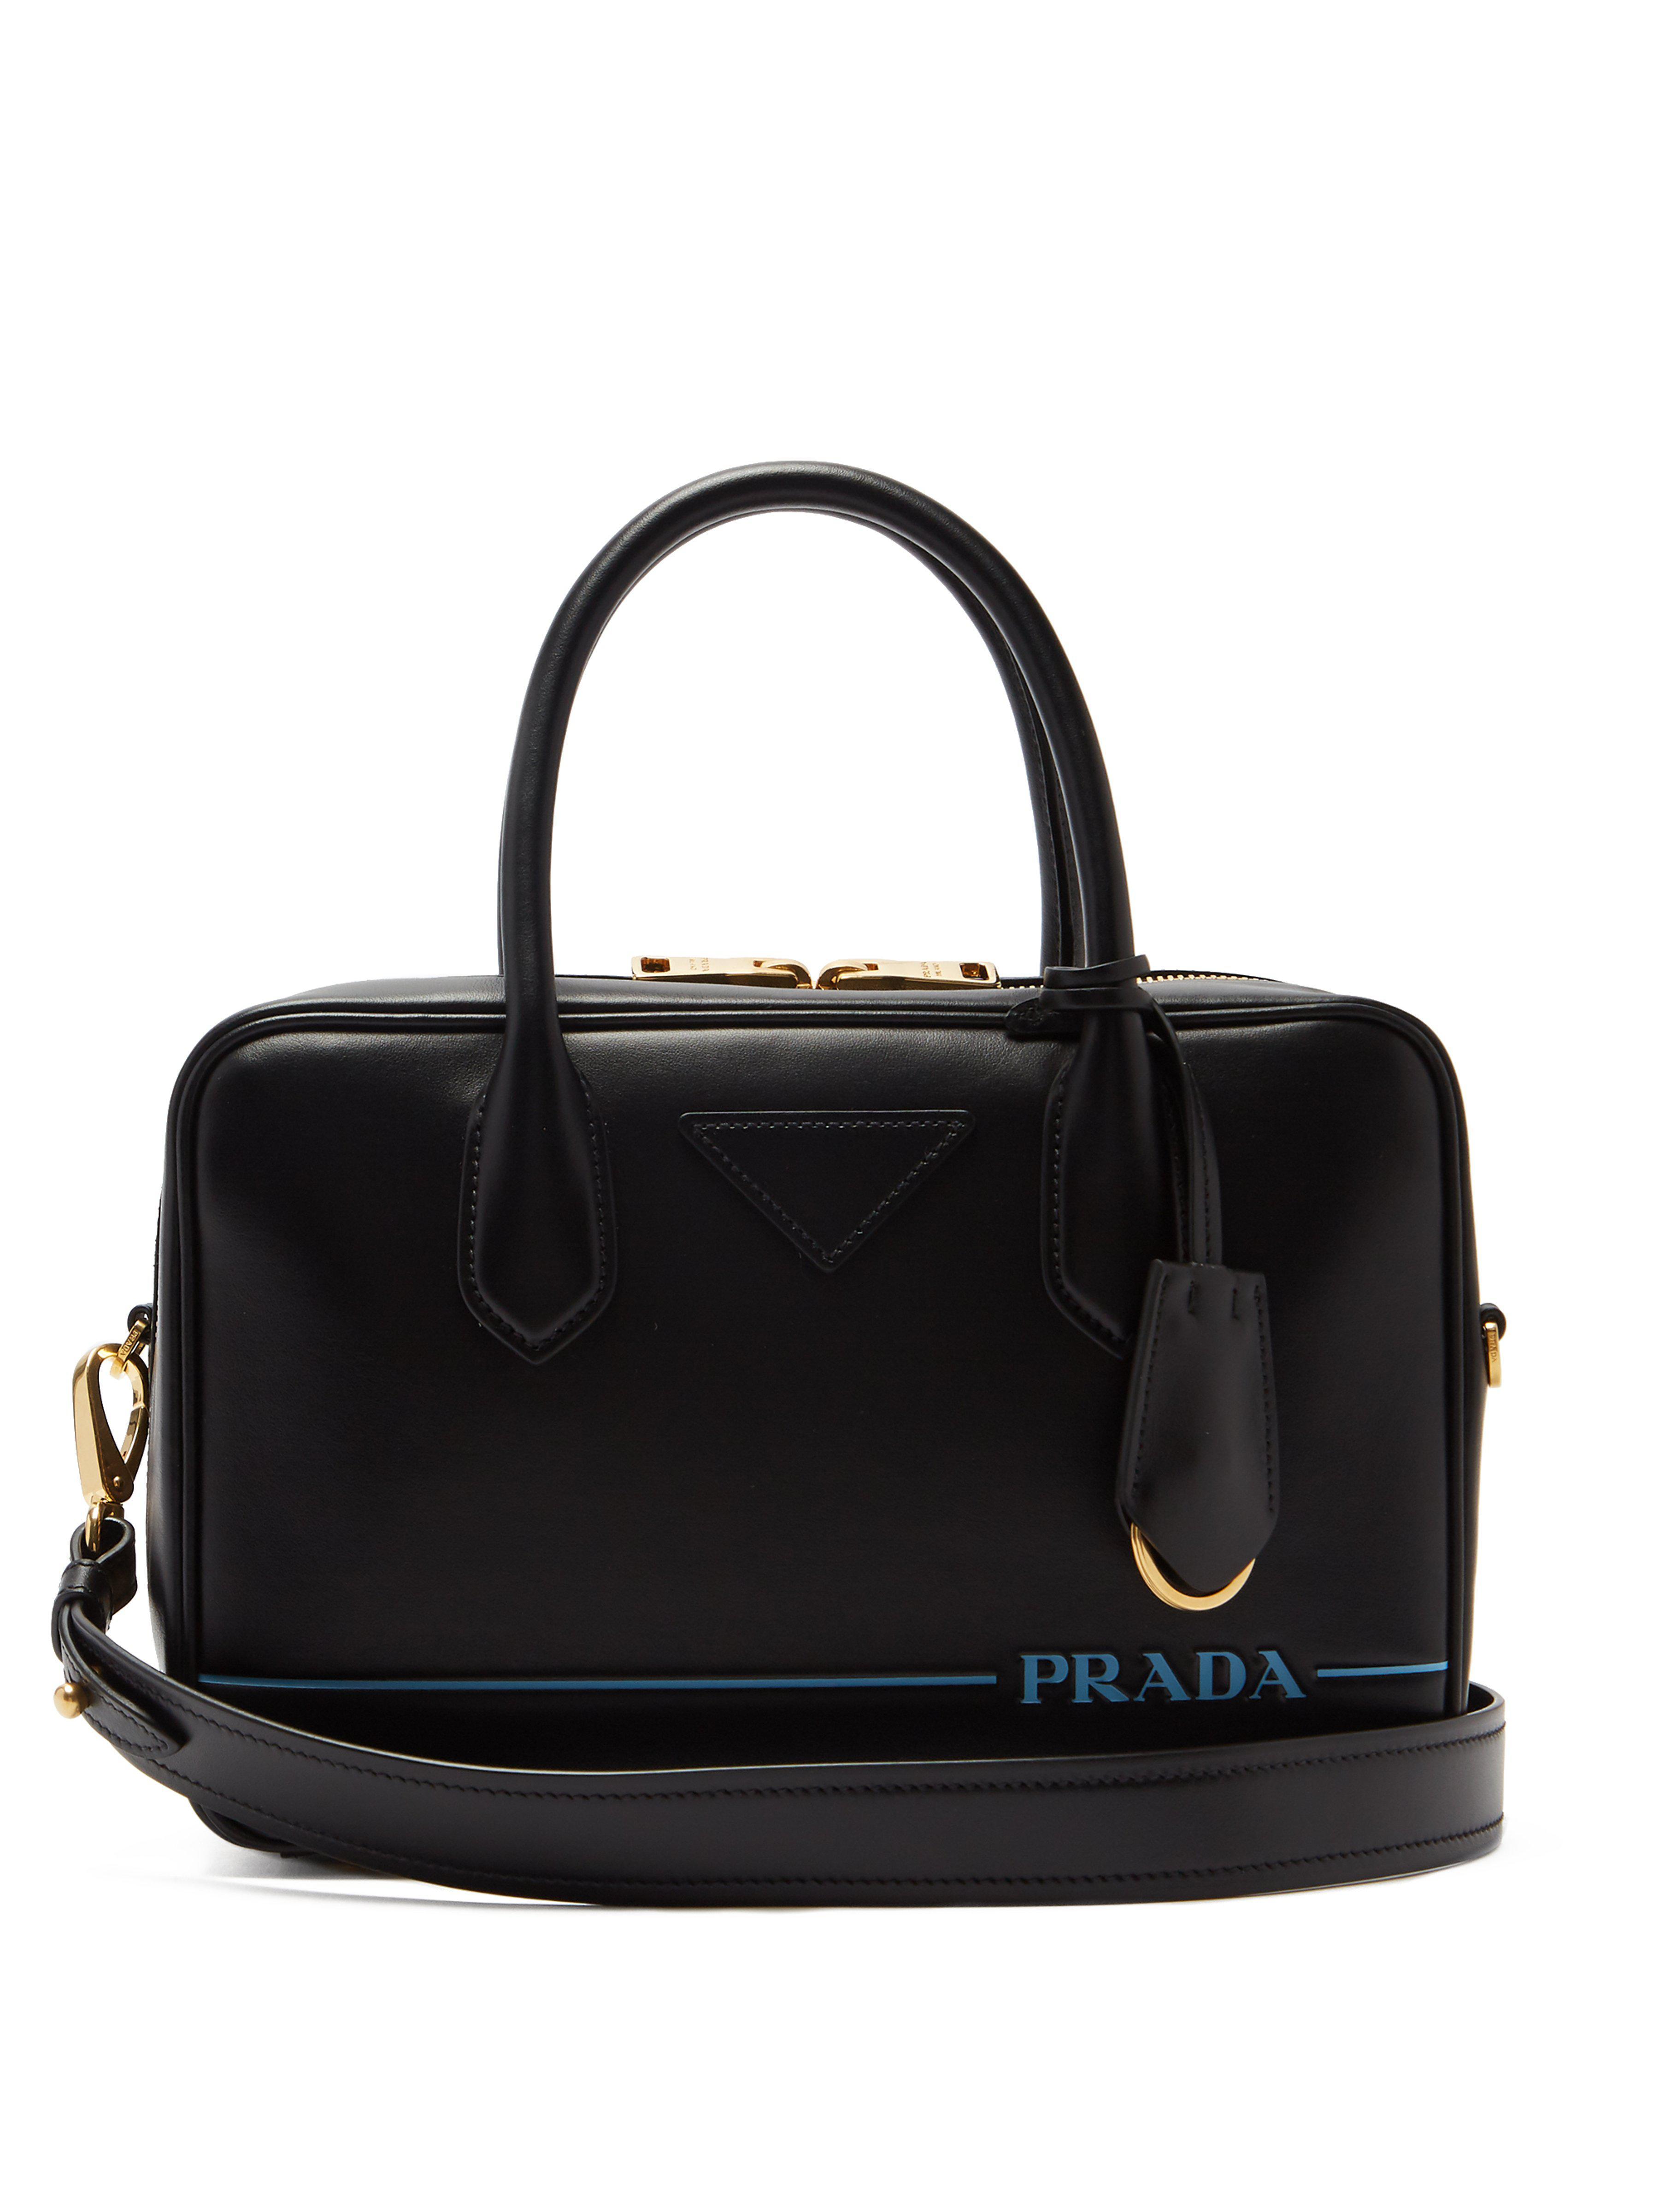 9d7c8b7fb11013 Prada Mirage Leather Bowling Bag in Black - Lyst